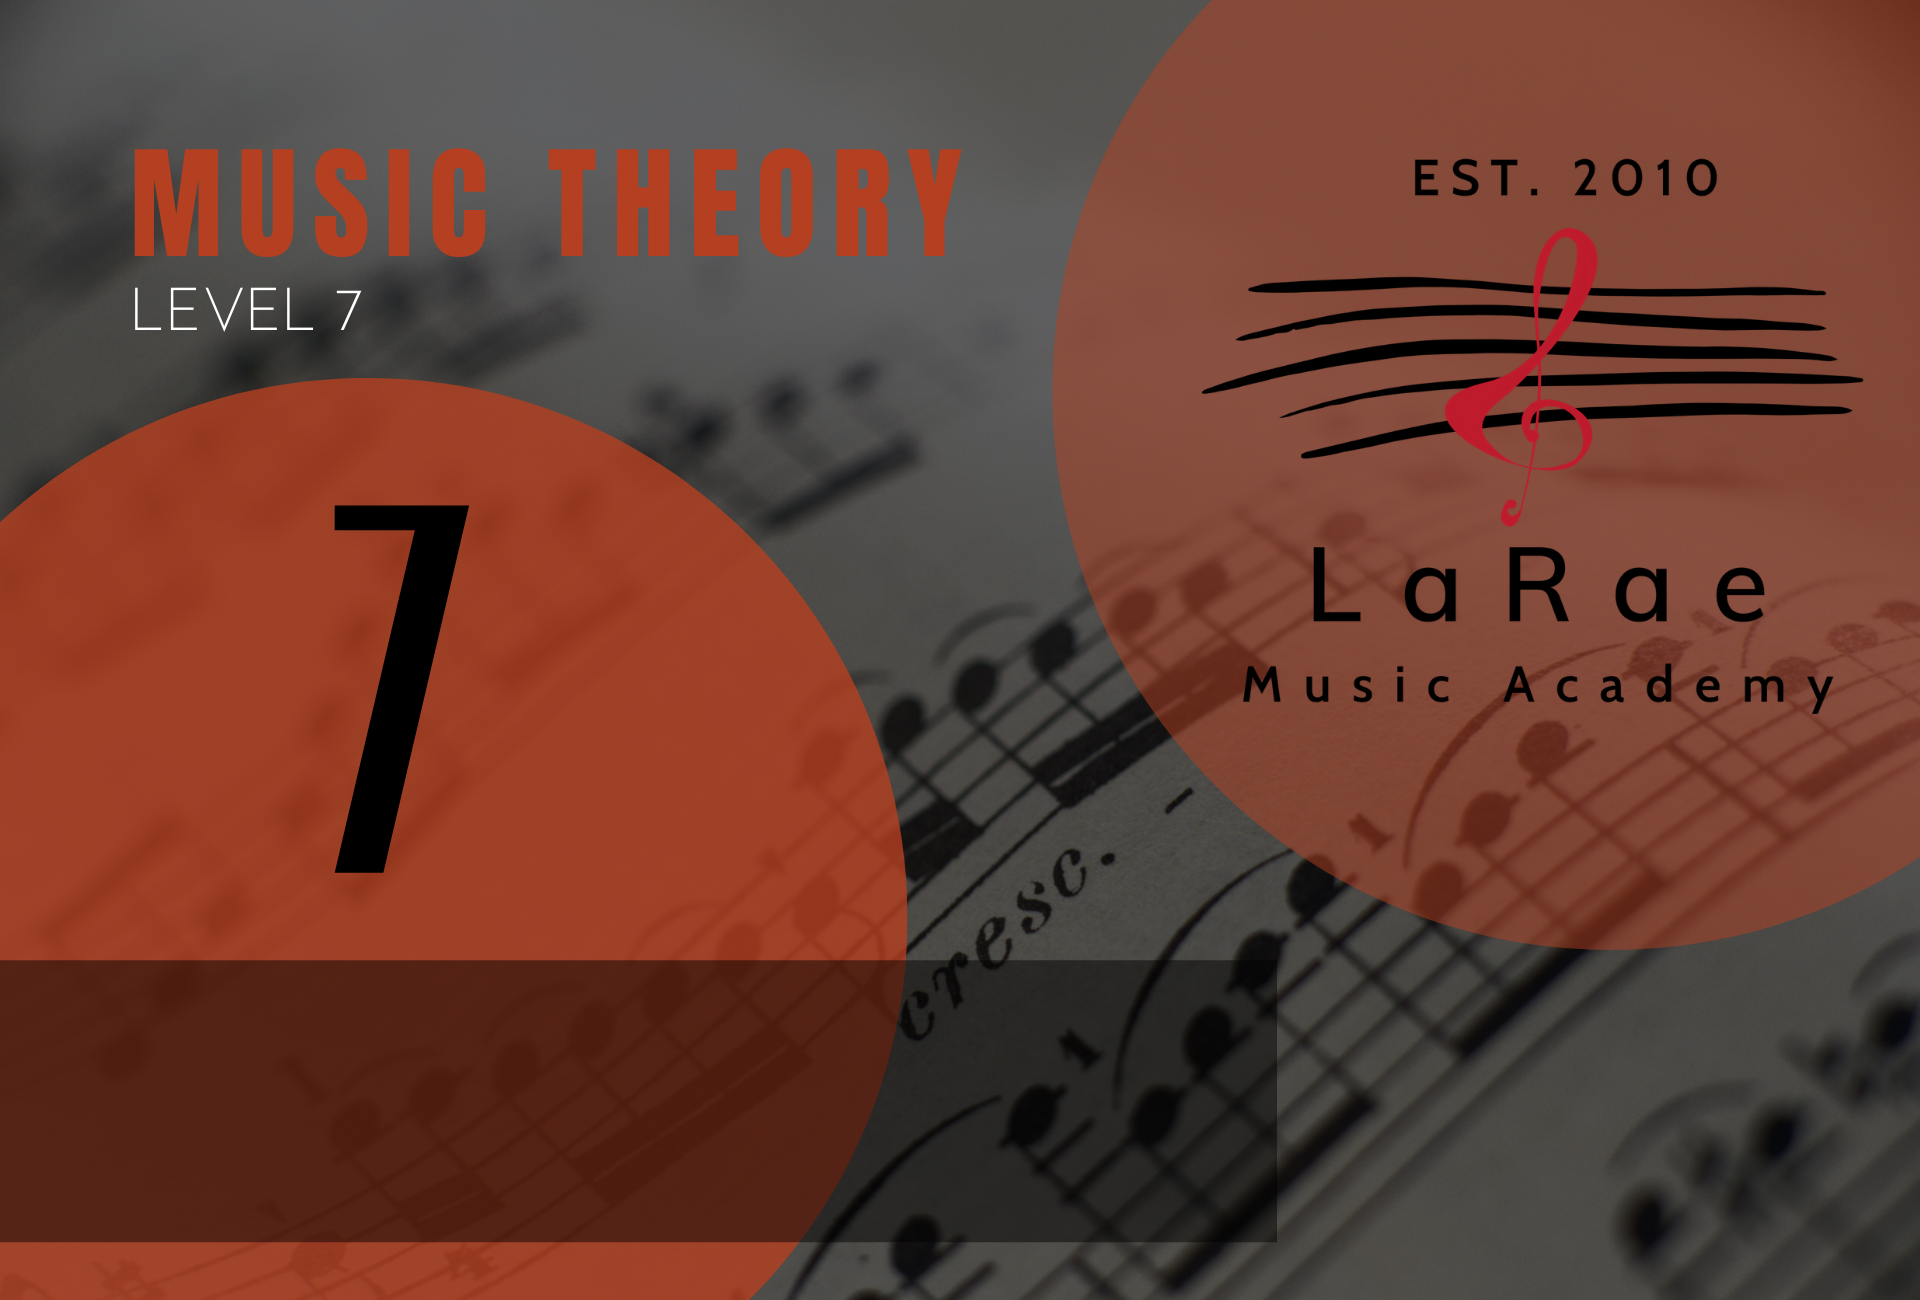 Music Theory Level 7